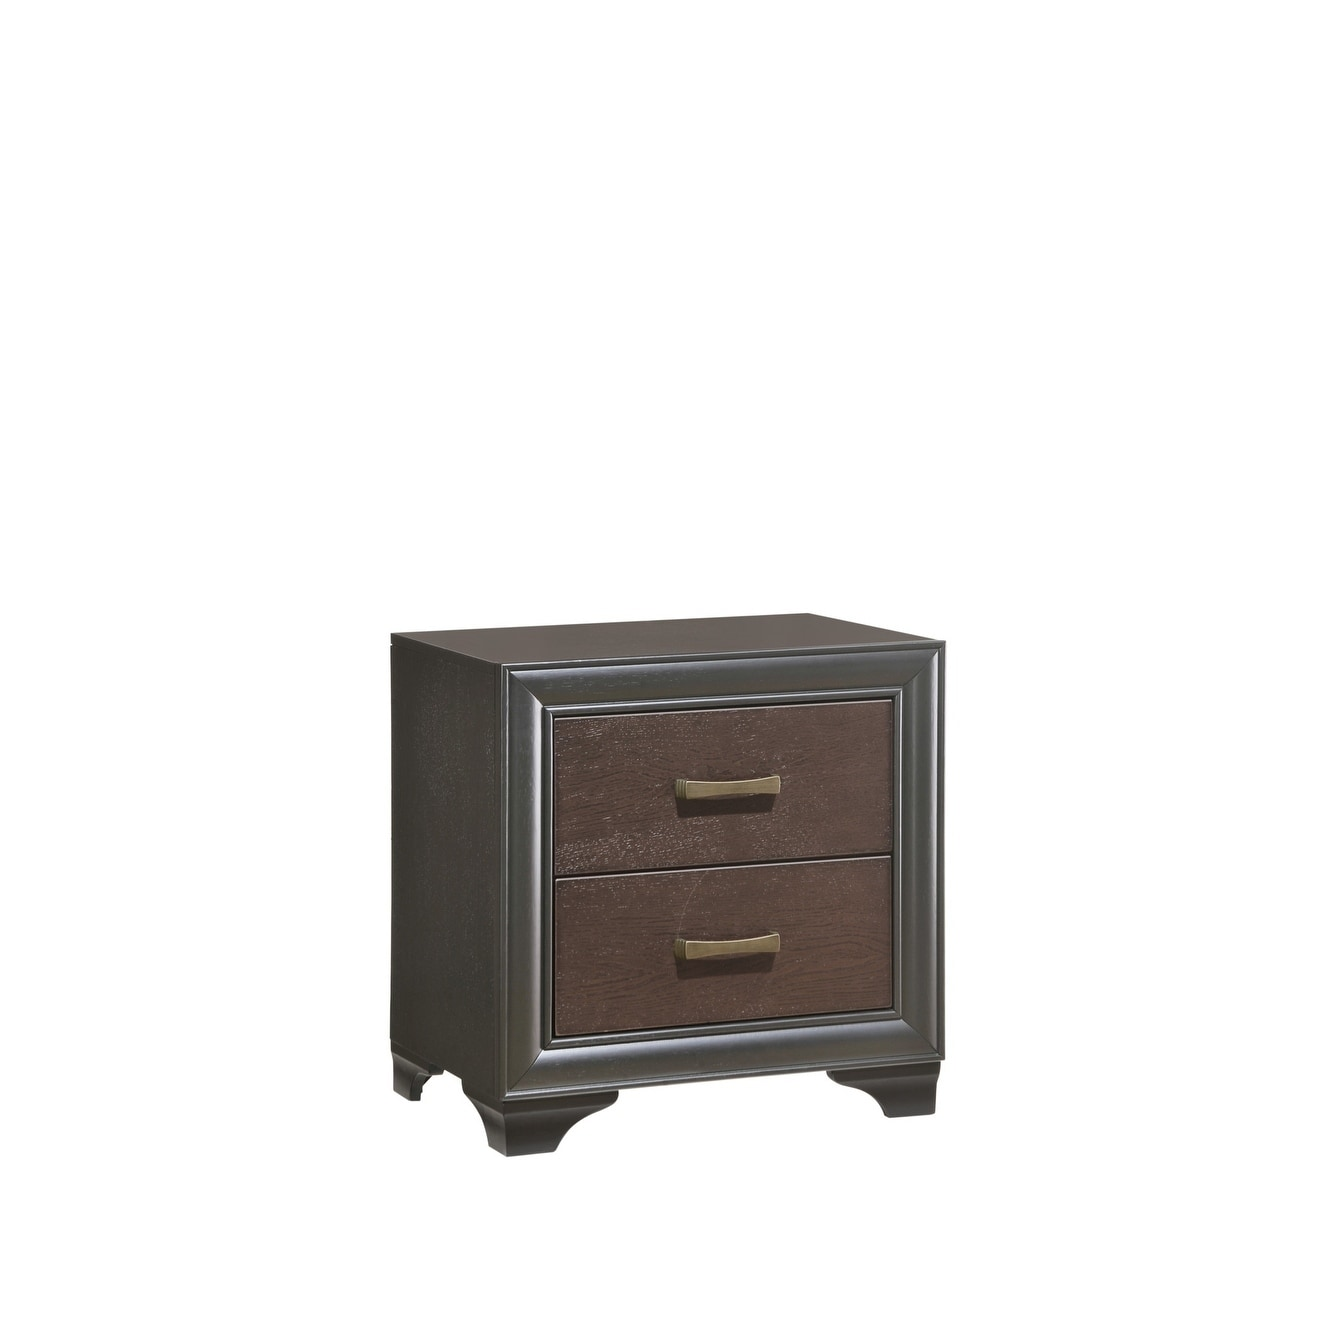 Emerald Home Prelude Honey Black 2-Drawer Nightstand (Brass)